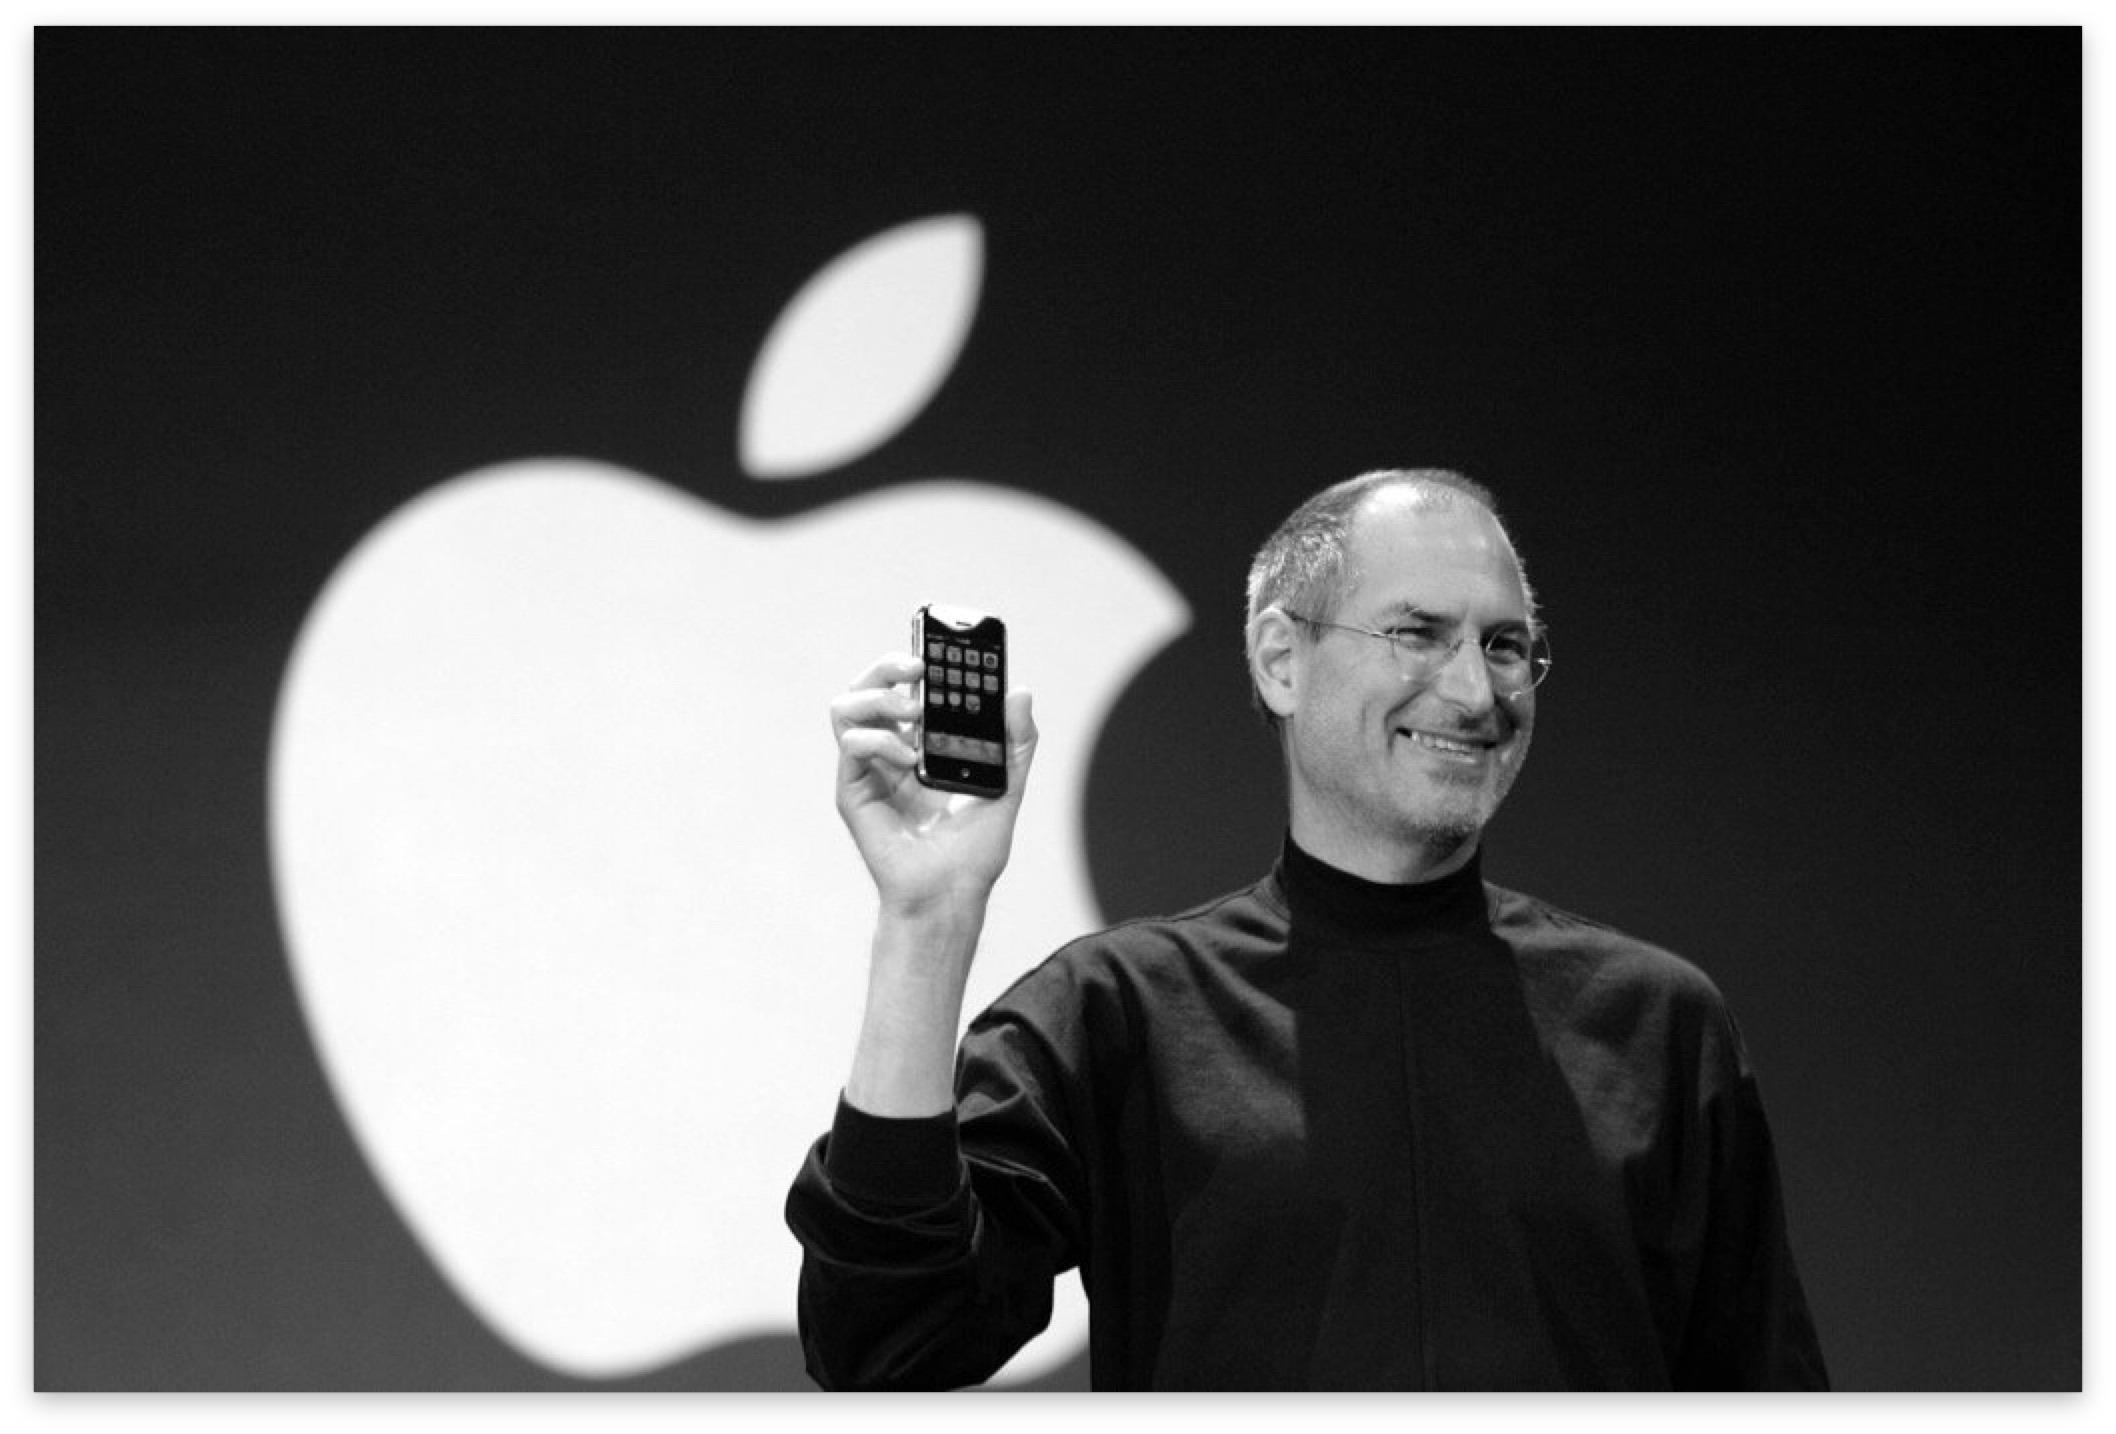 Steve Jobs mostra l'iPhone originale sul palco